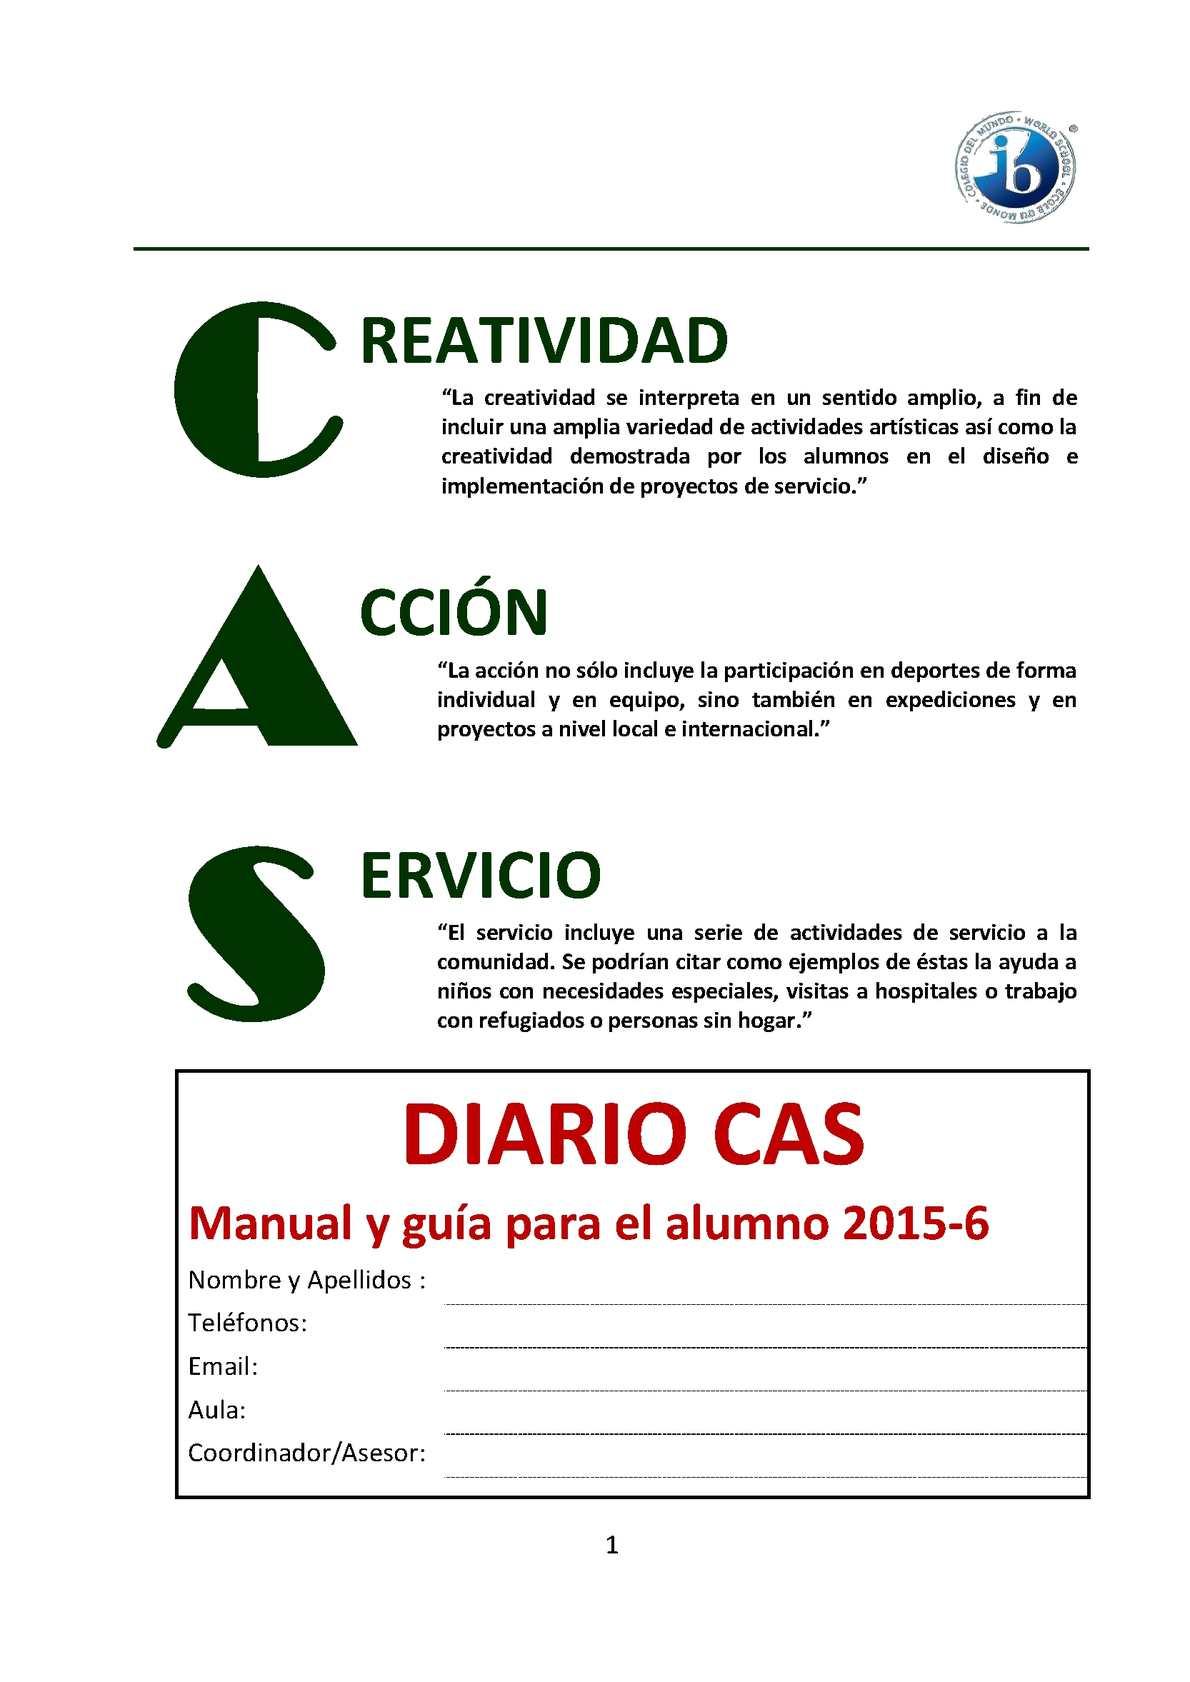 Formato Diario Cas 2015